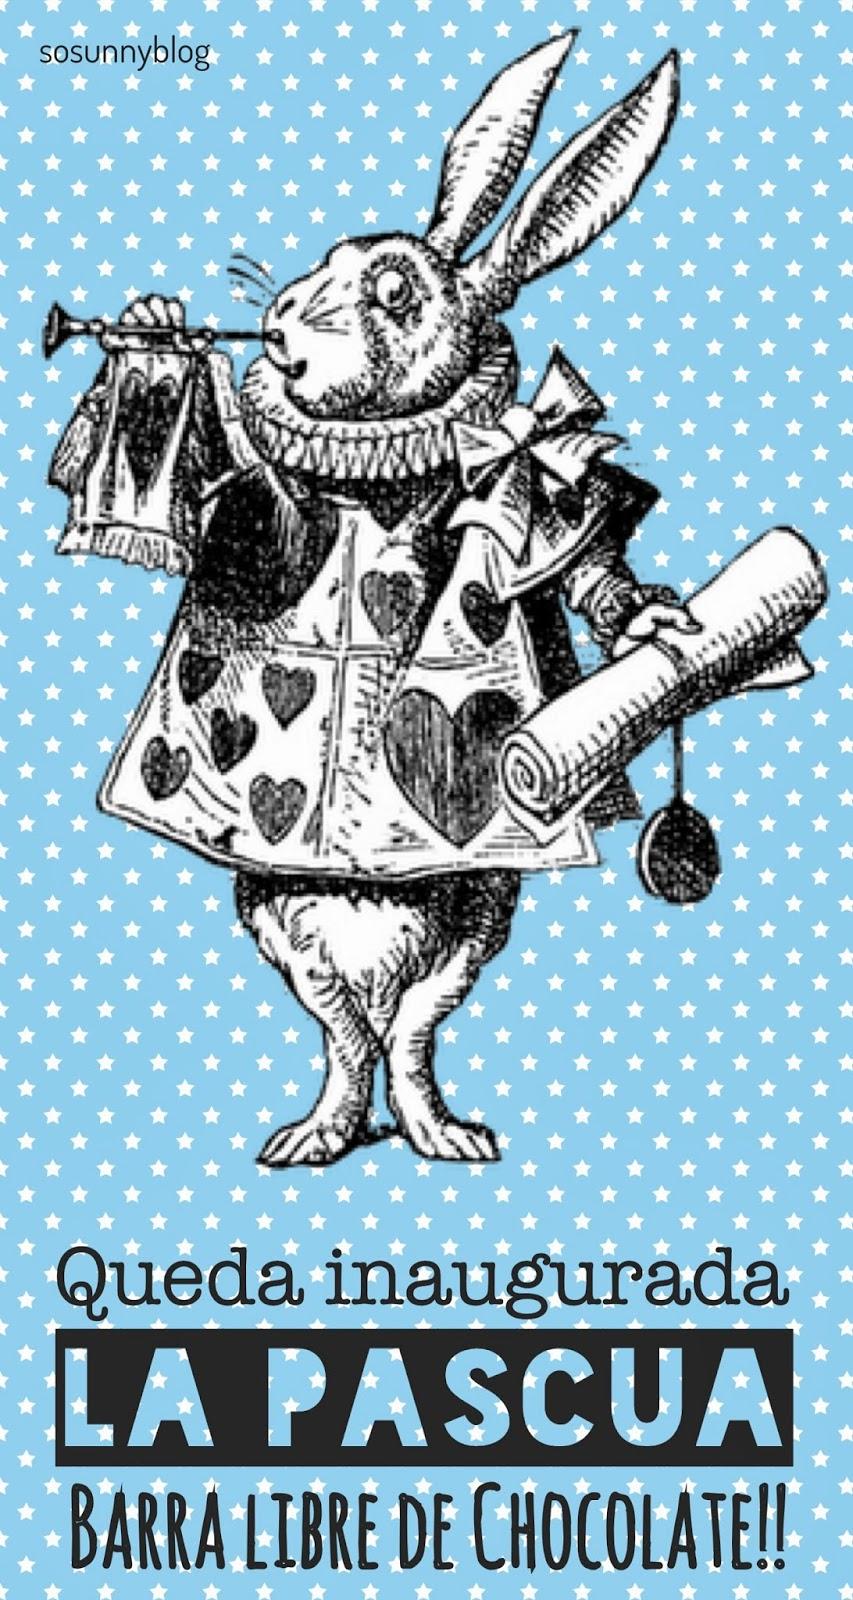 http://sosunnyblog.blogspot.com.es/2014/03/chocolate-para-pascua-diy.html